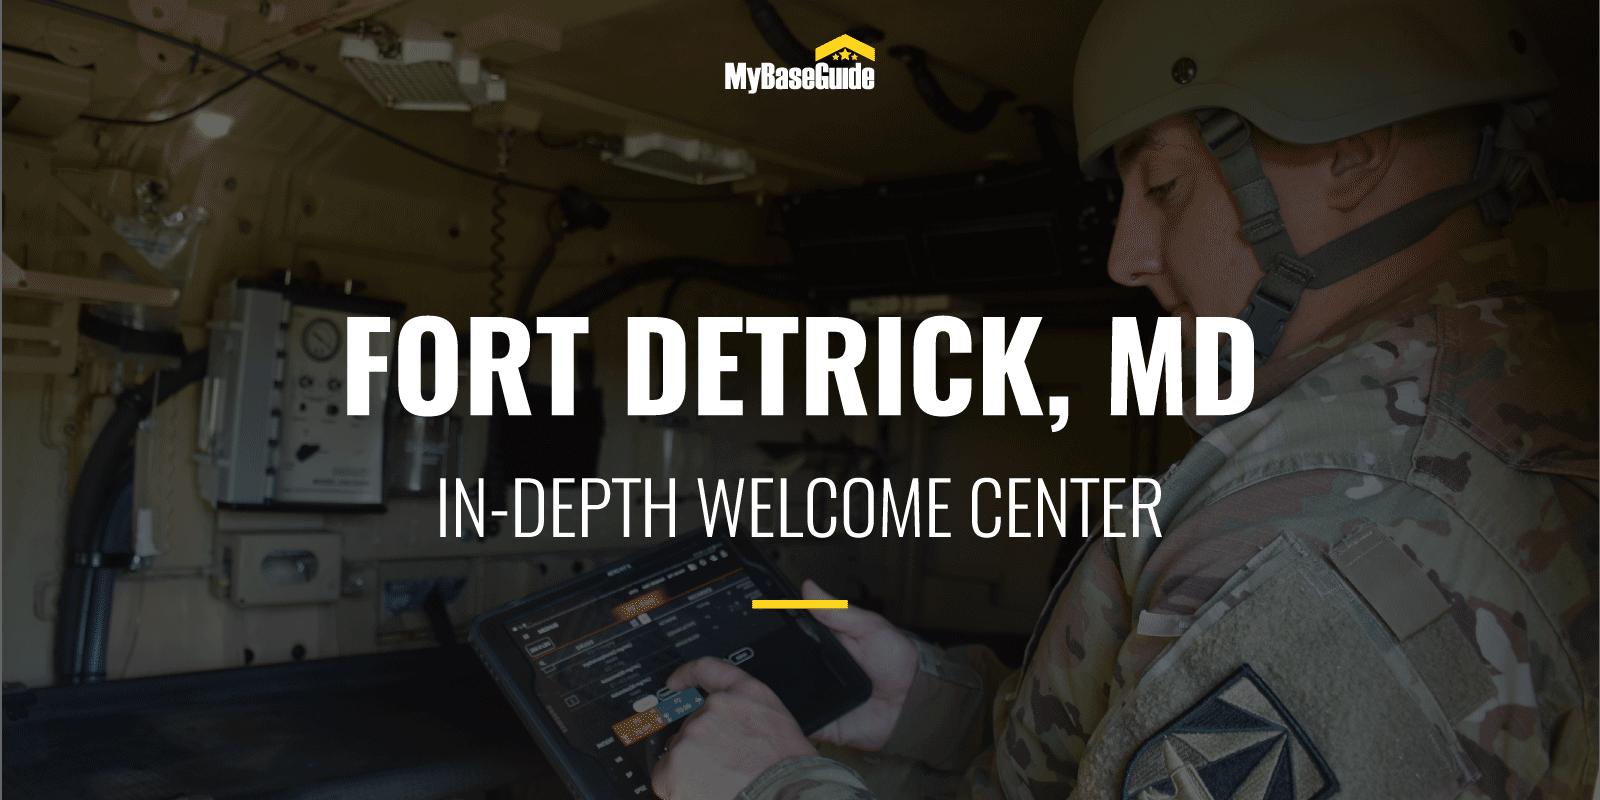 Fort Detrick, MD: In-Depth Welcome Center